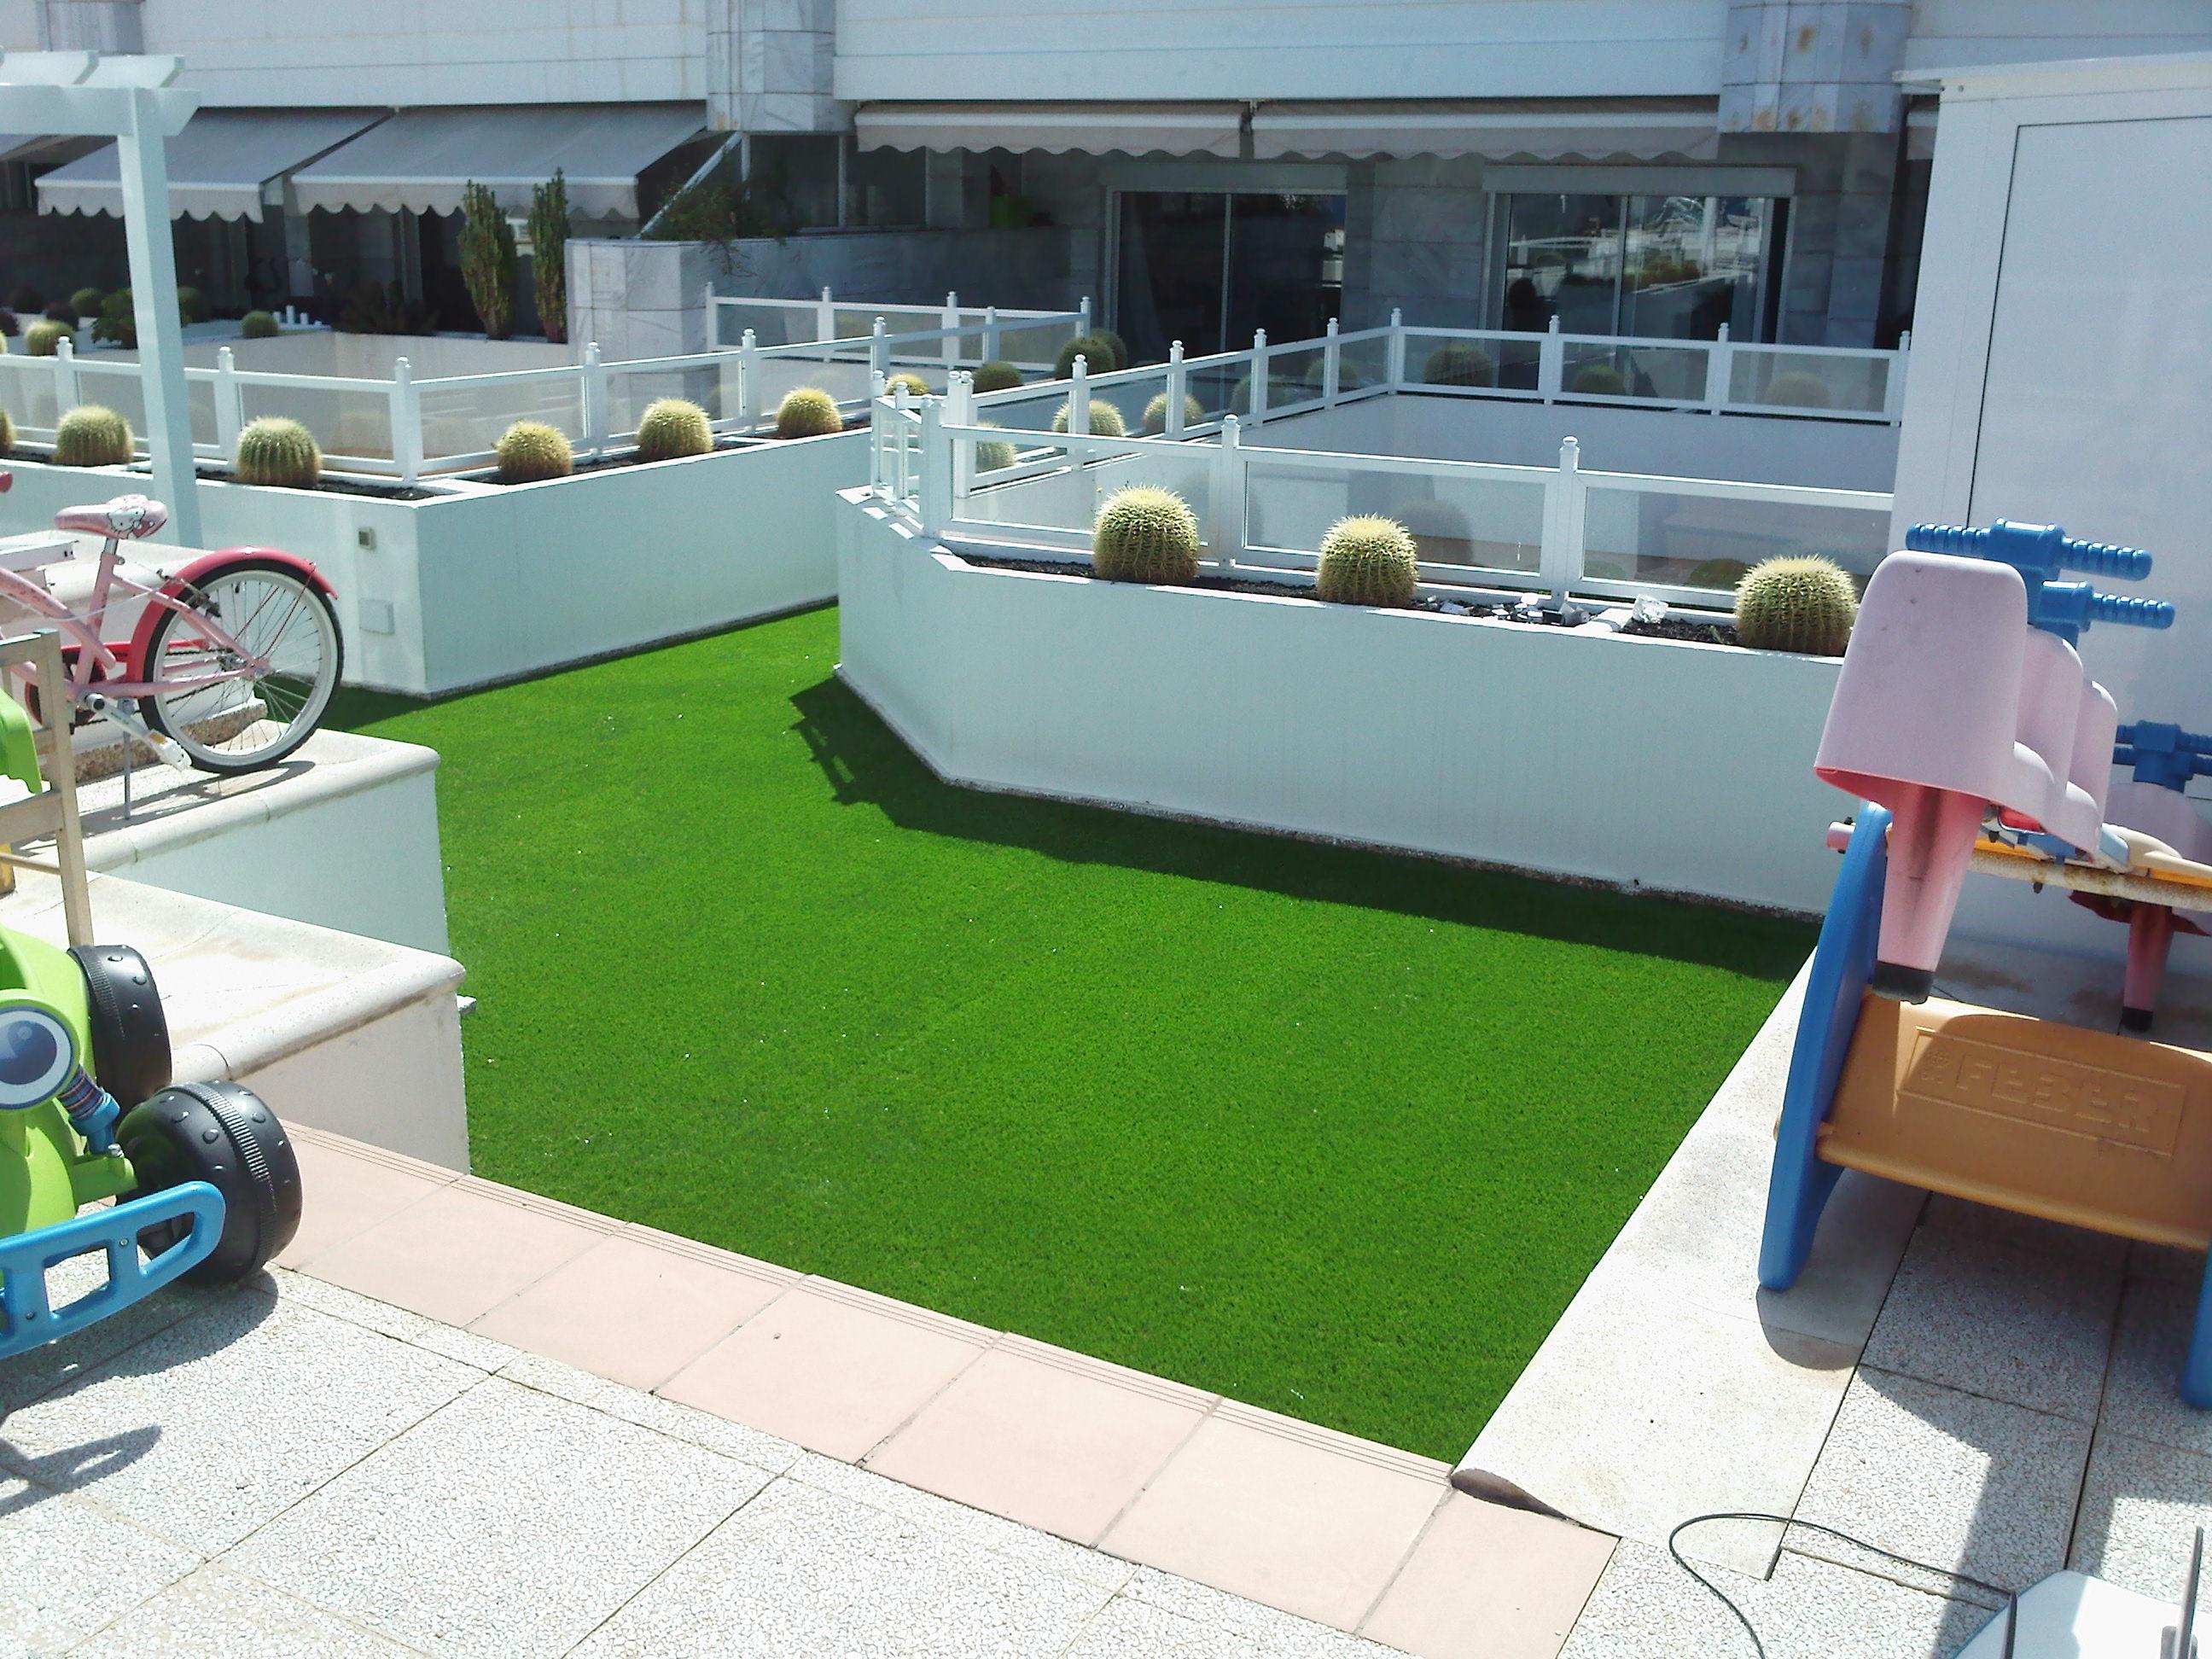 Canary islands garden s c p telde - Poner cesped artificial en terraza ...